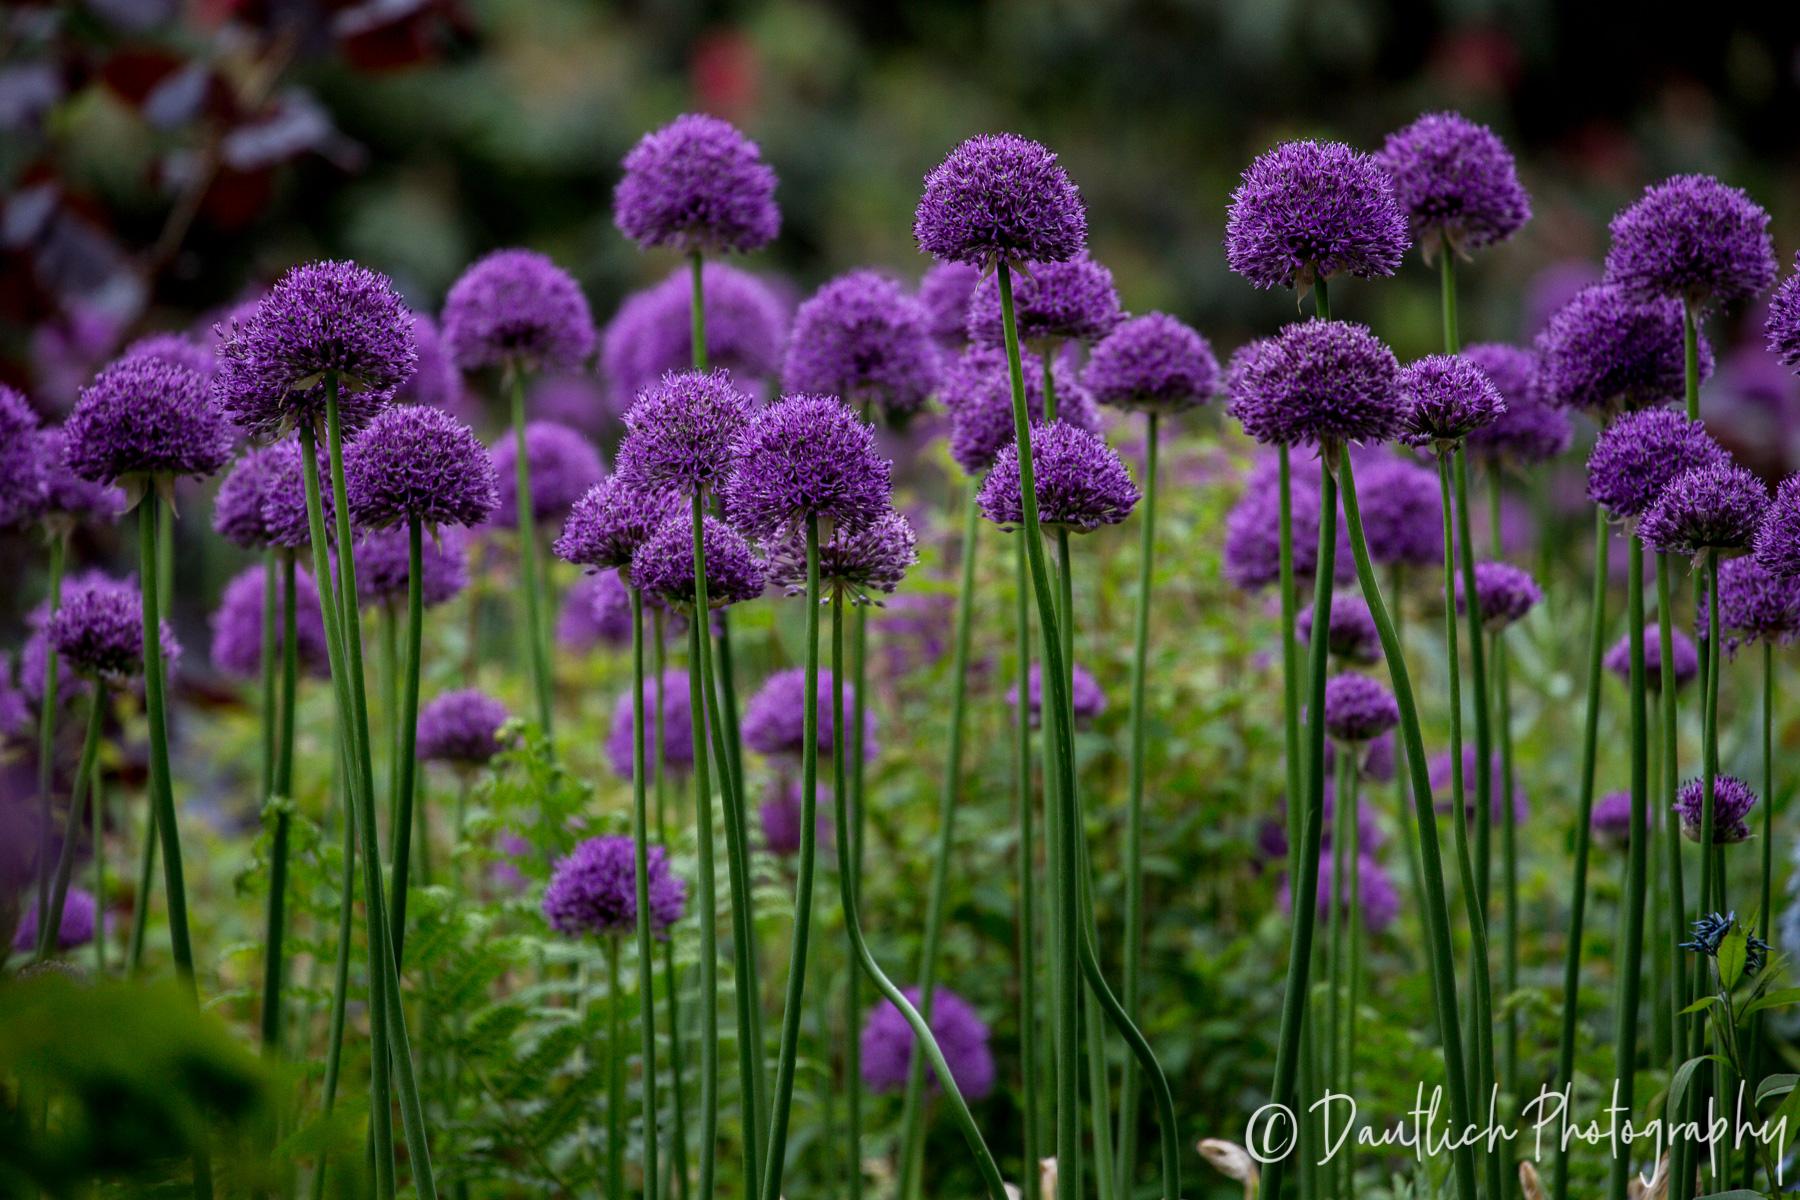 05.16.18 Nymans purple ball flowers.jpg